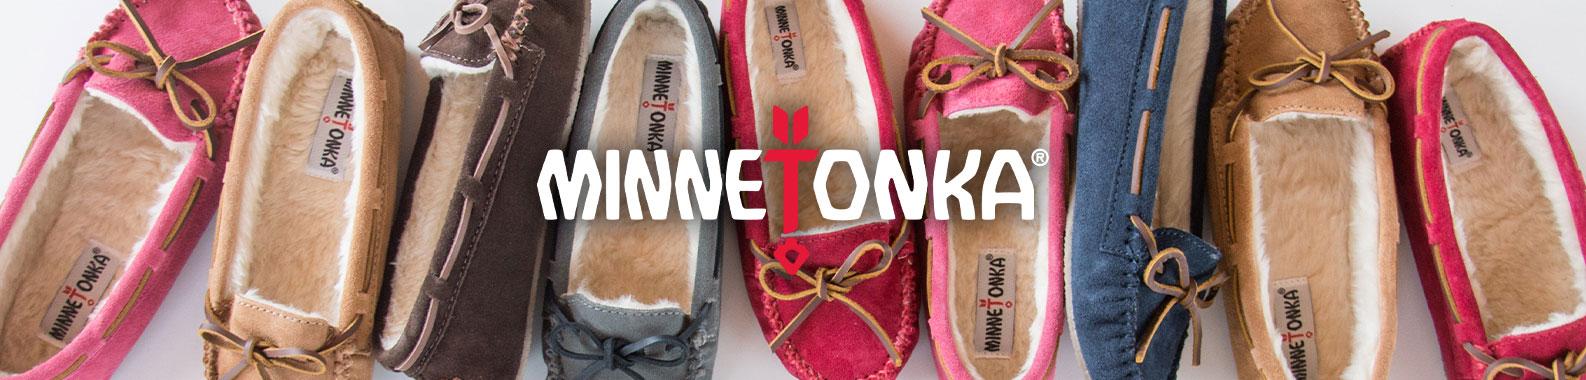 Minnetonka brand header image